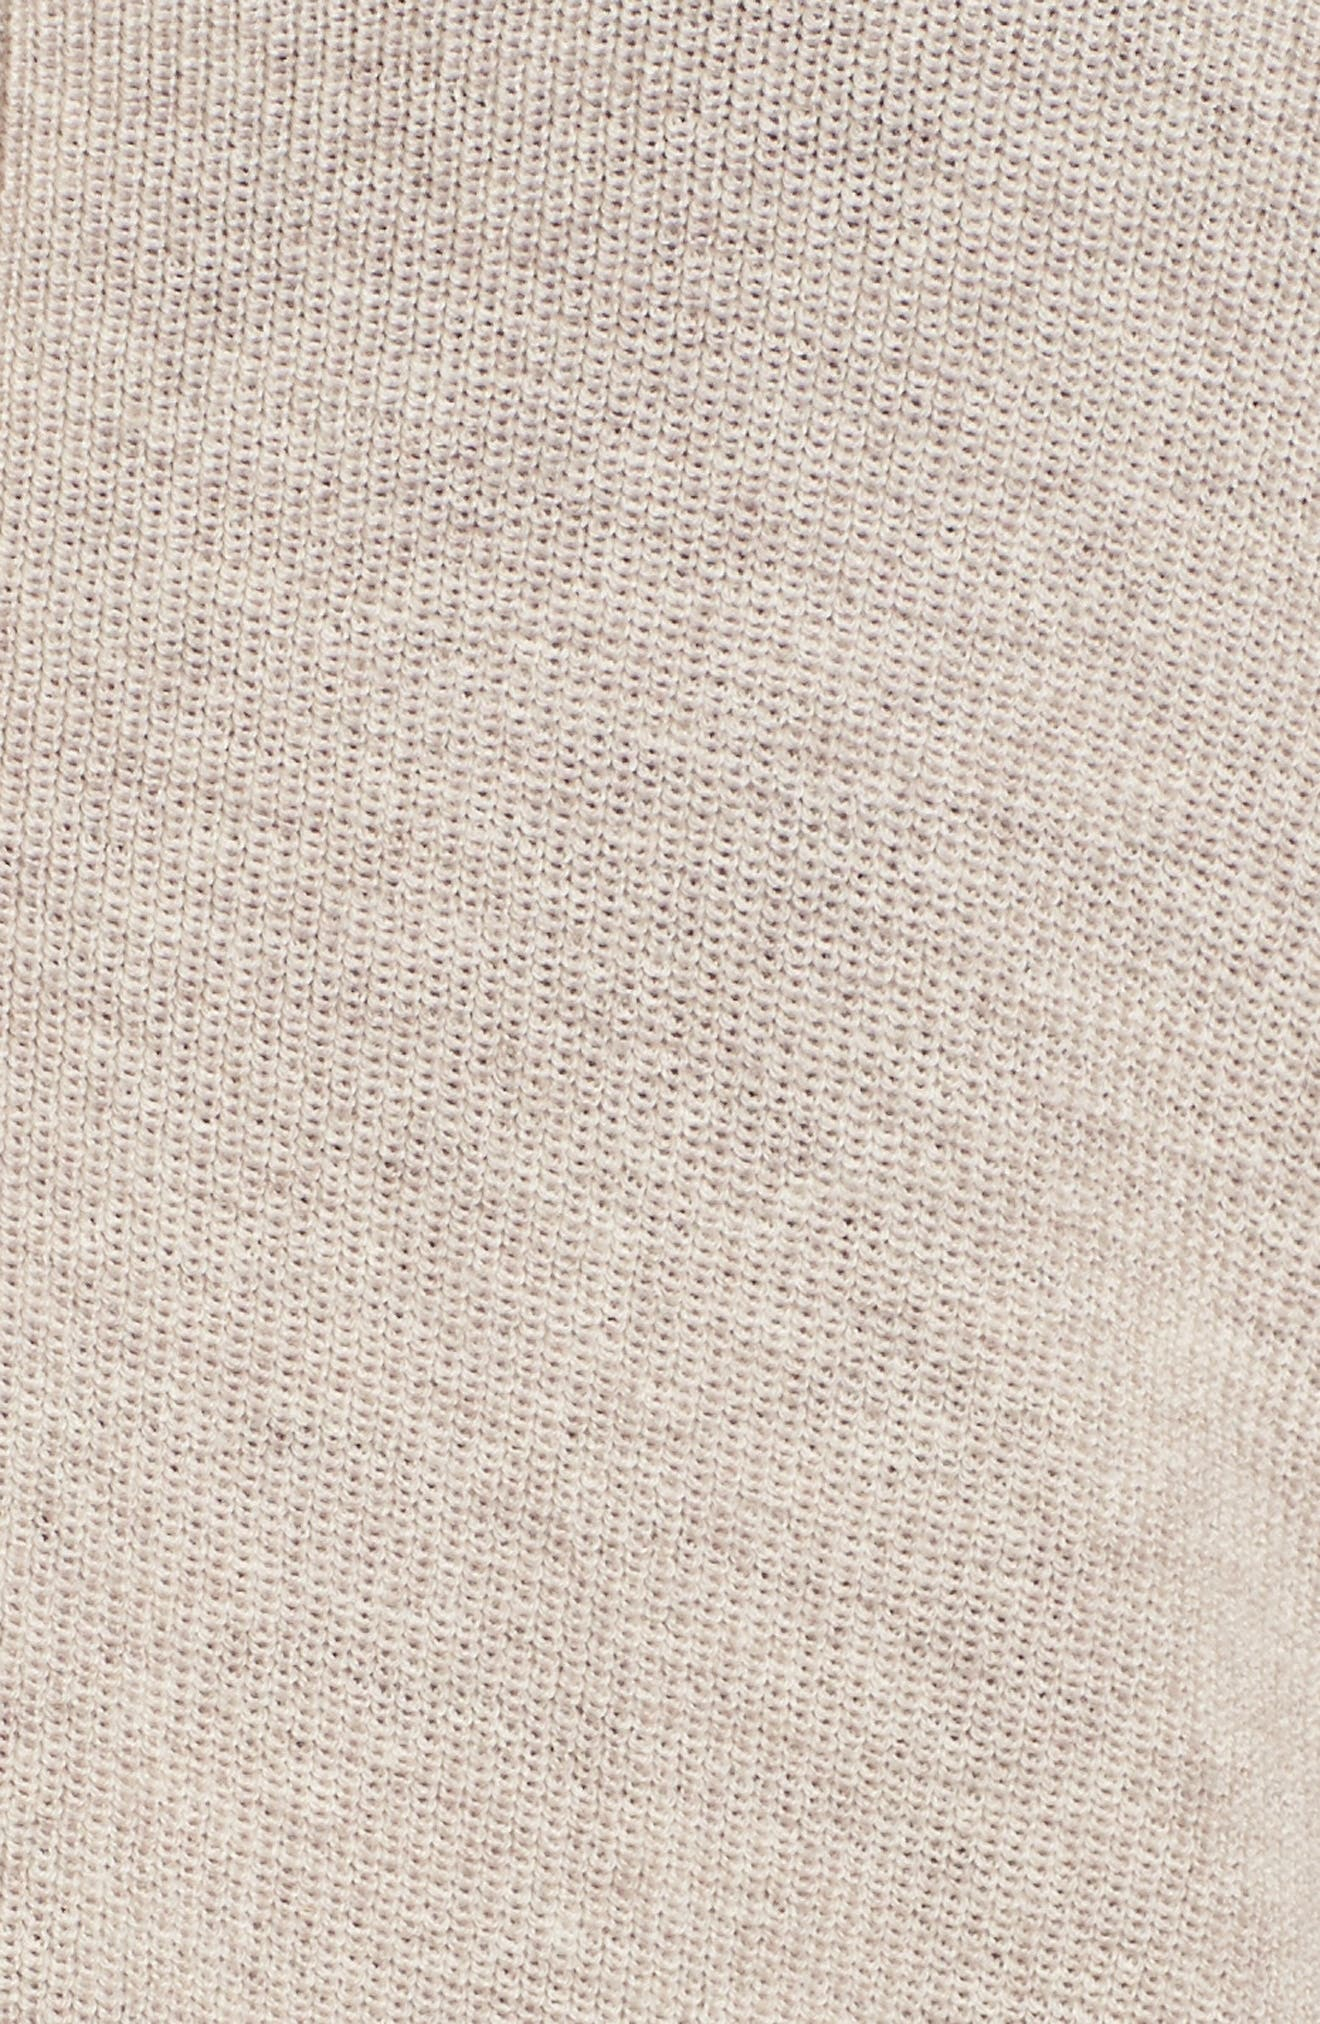 V-Neck Merino Wool Cardigan,                             Alternate thumbnail 5, color,                             Brown